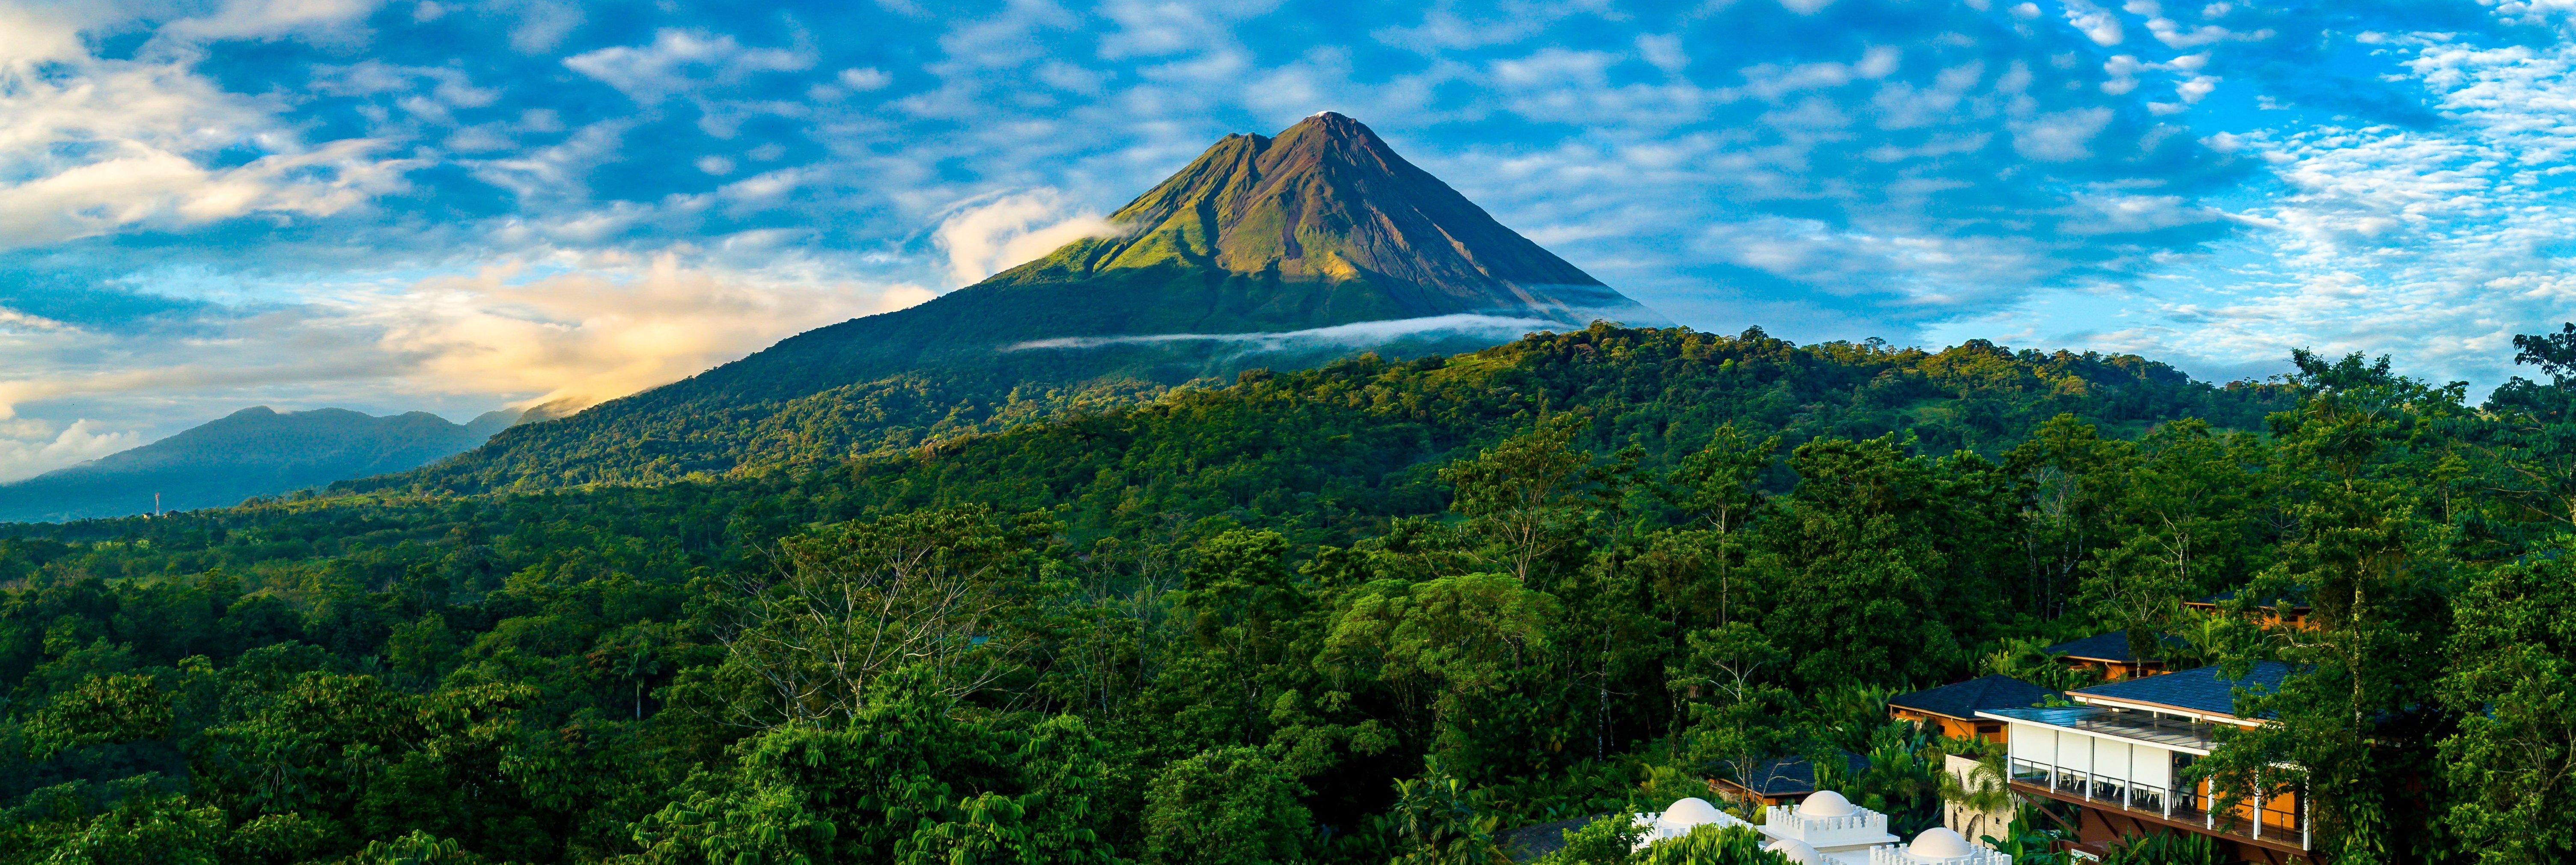 arenal-volcano-costa-rica